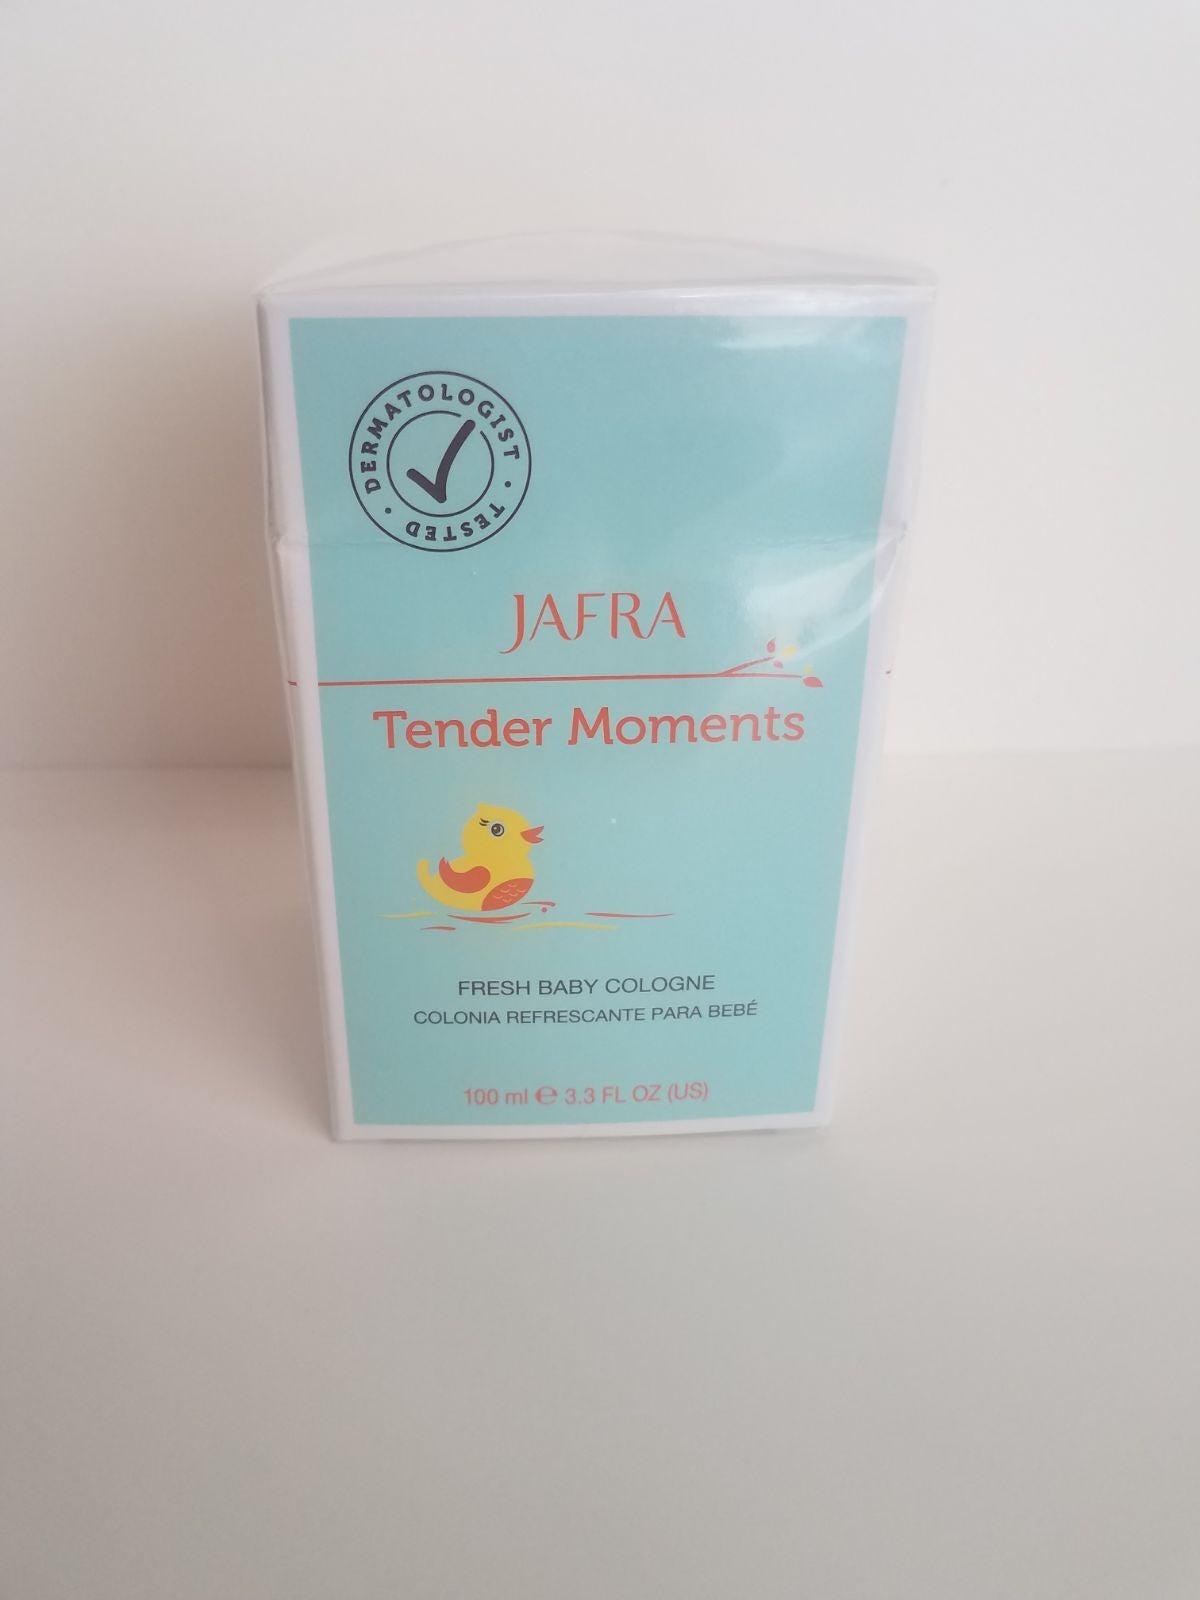 Jafra baby cologne Tender Moments